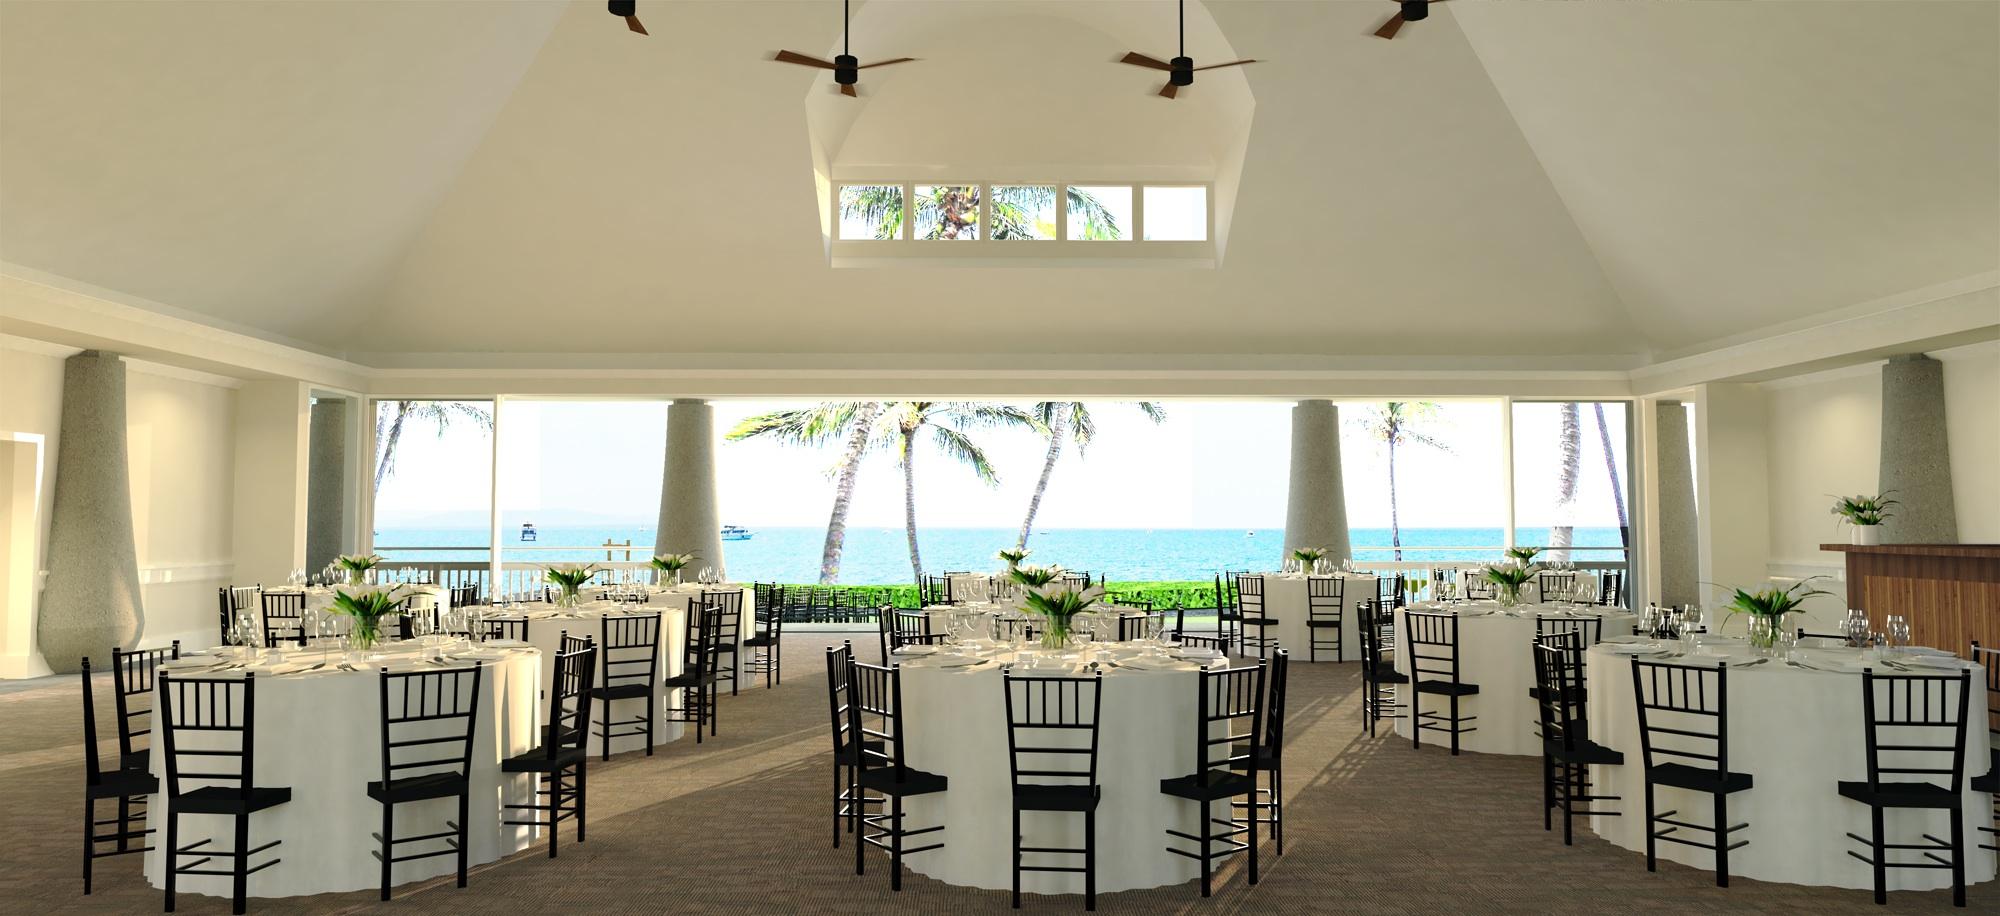 SUGAR BEACH - Great room.jpg